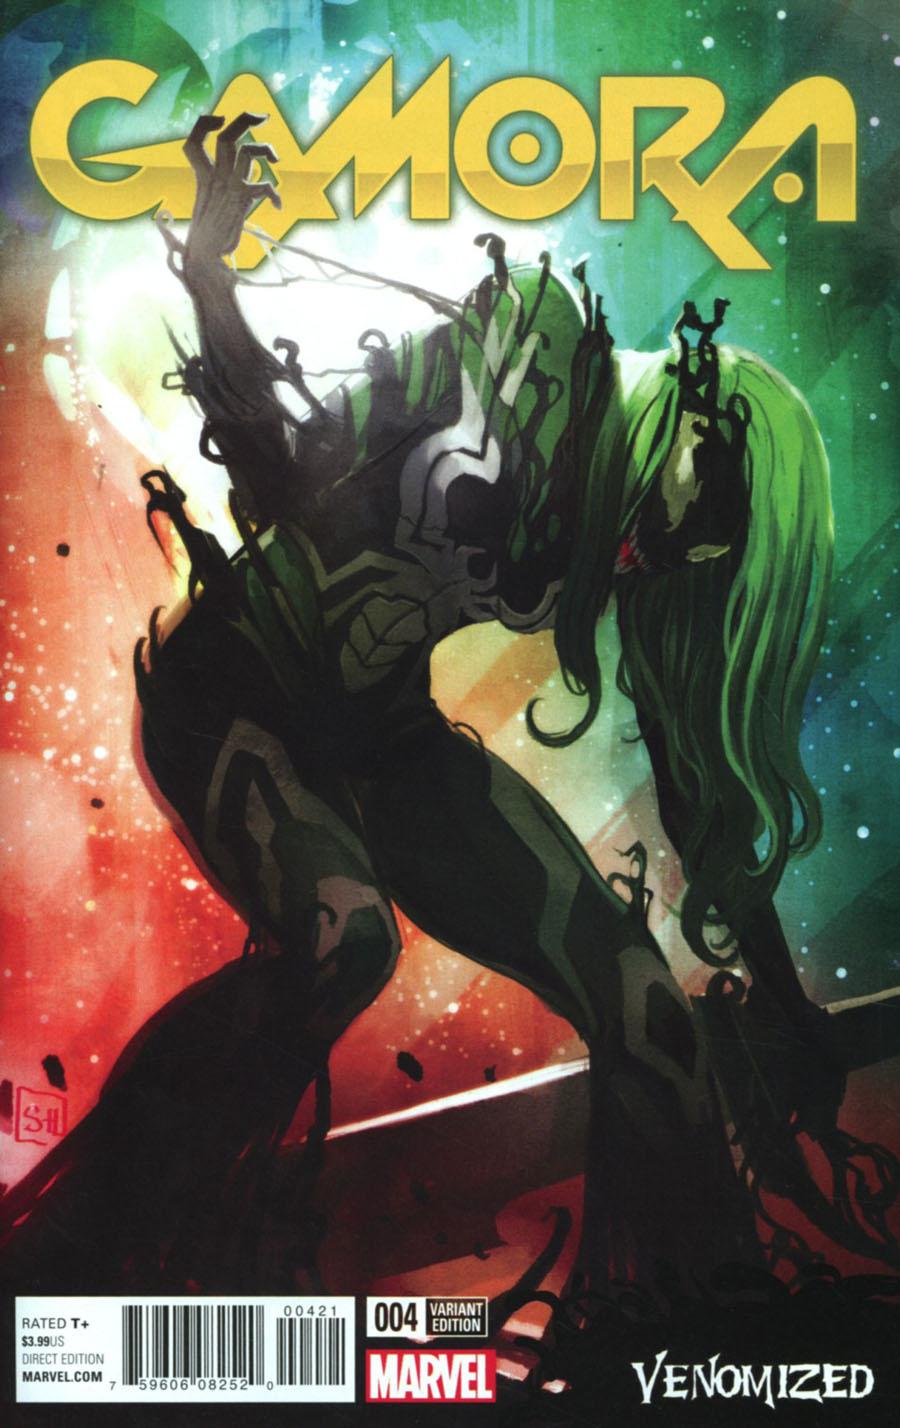 Gamora #4 Cover B Variant Stephanie Hans Venomized Cover